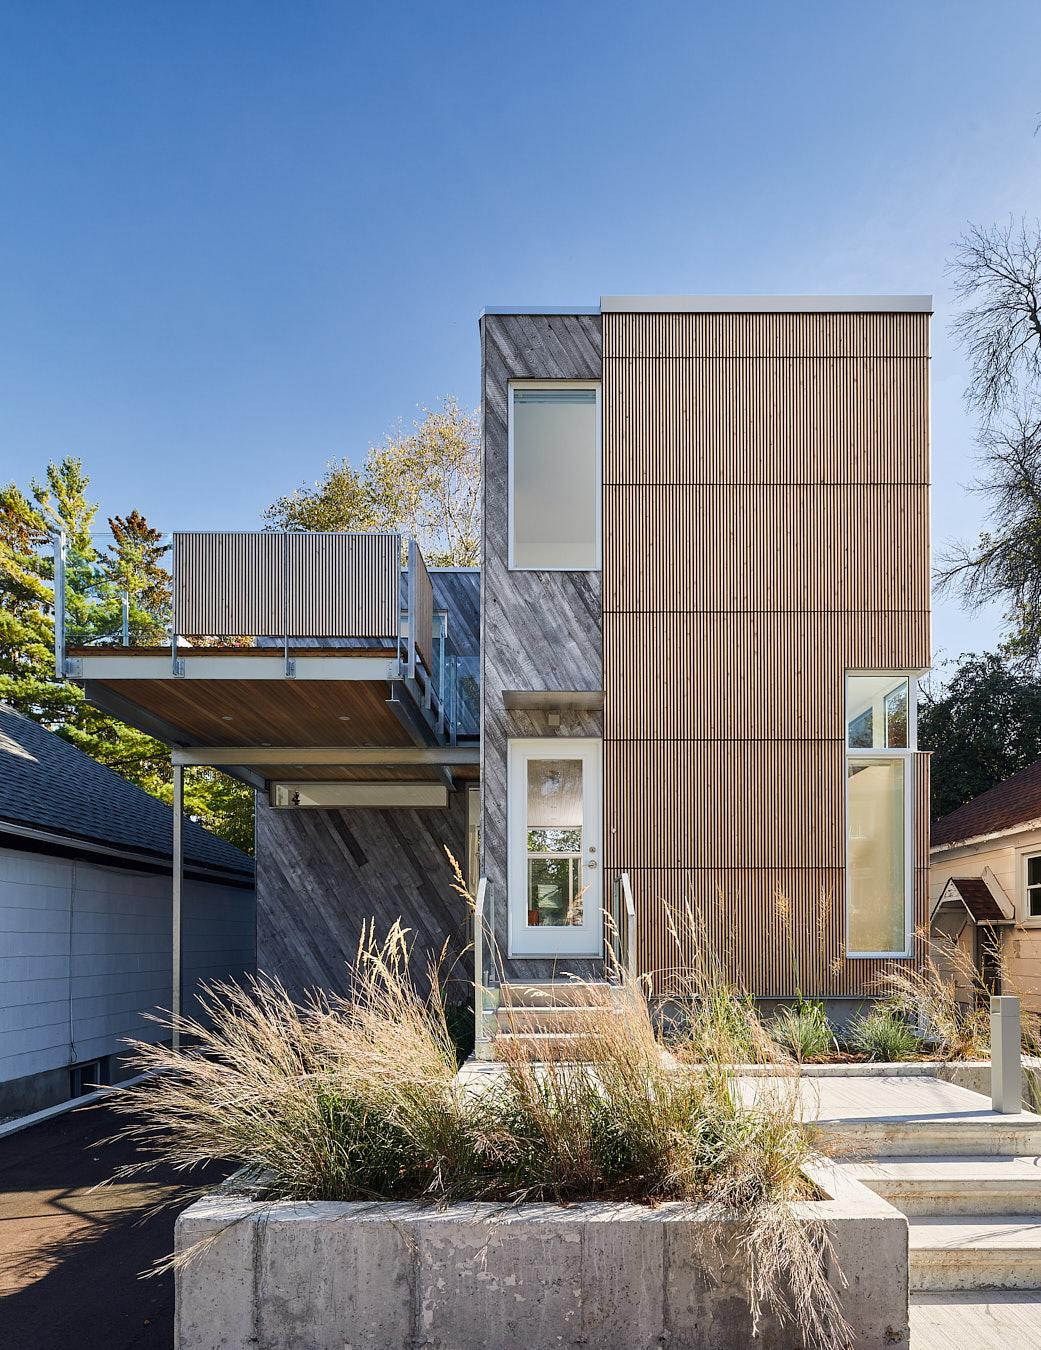 027-Shean Architects Fentiman.jpg